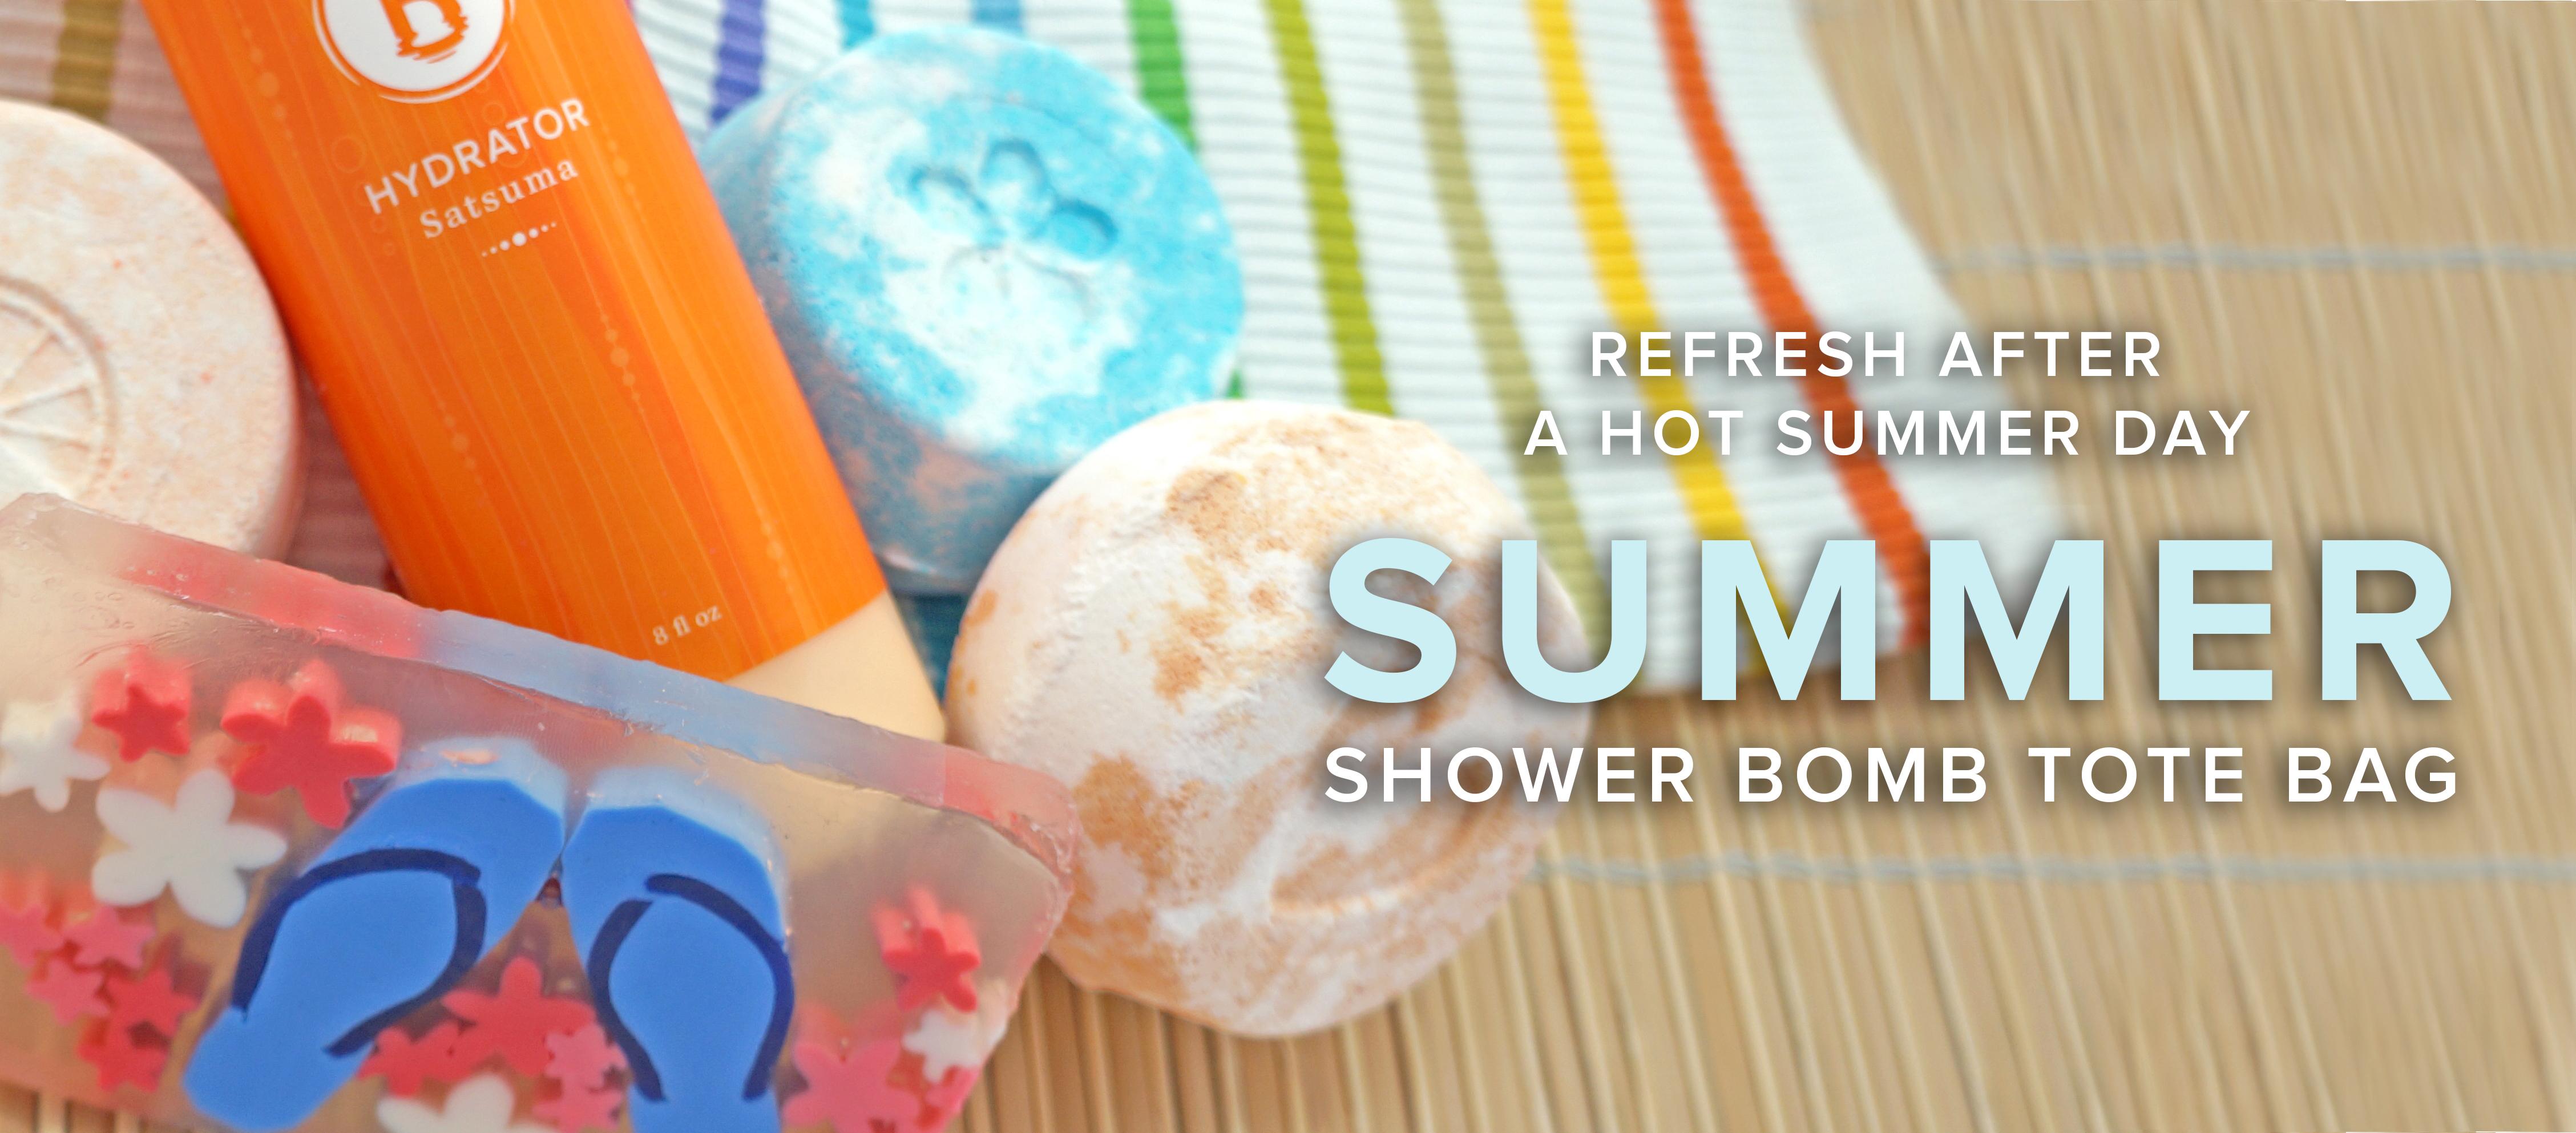 Summer Shower Bomb Tote Bag